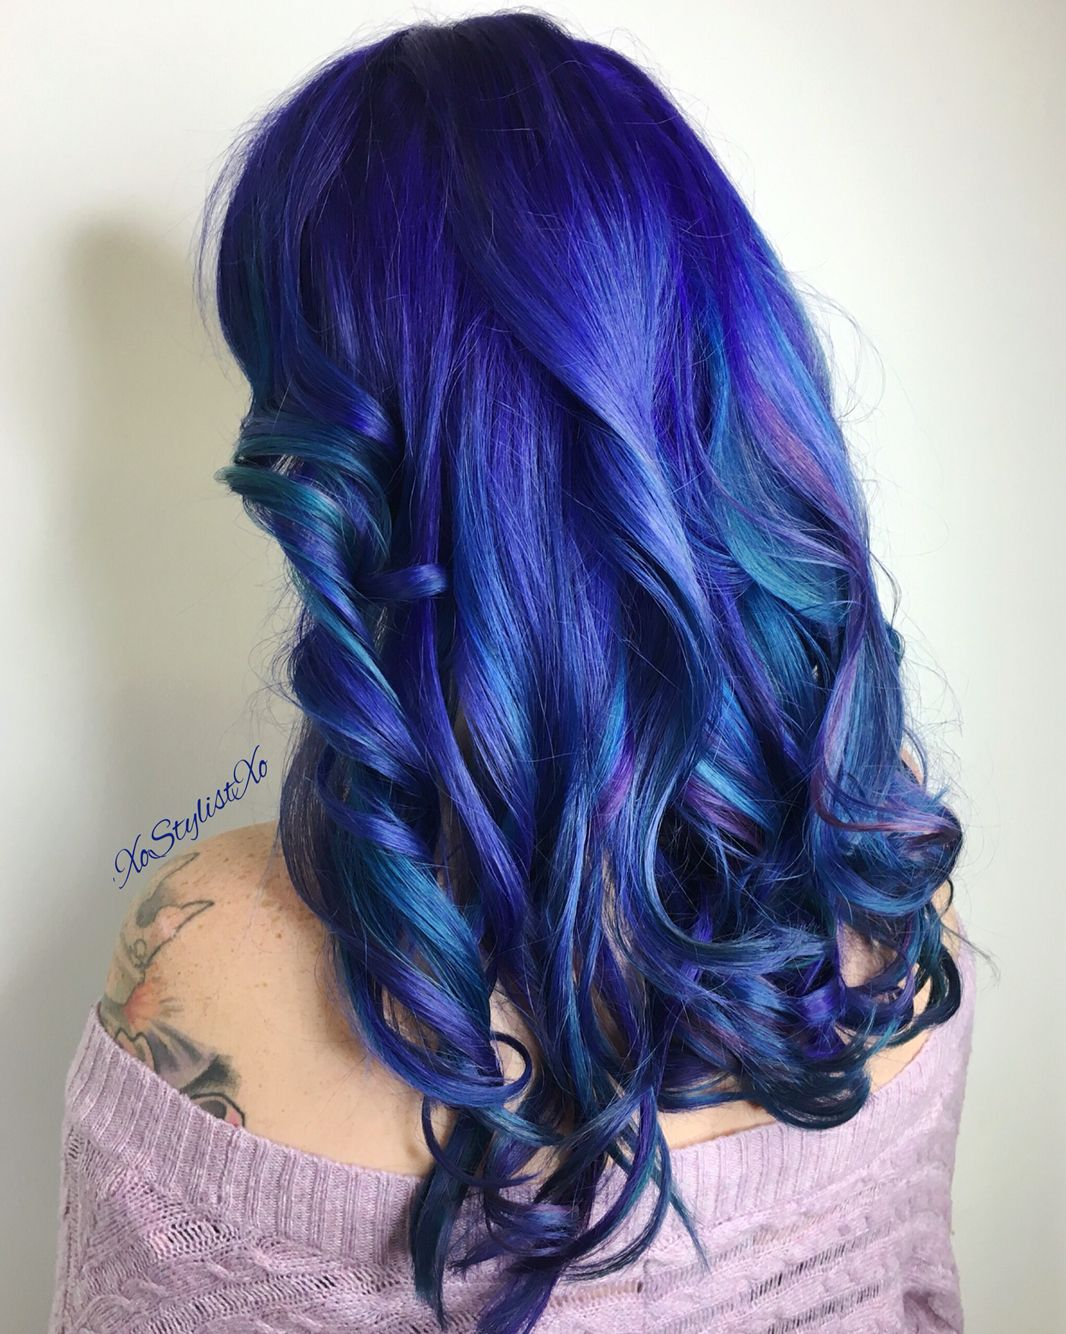 Winter blues hair trendue gorgeous msi hair nails u beauty